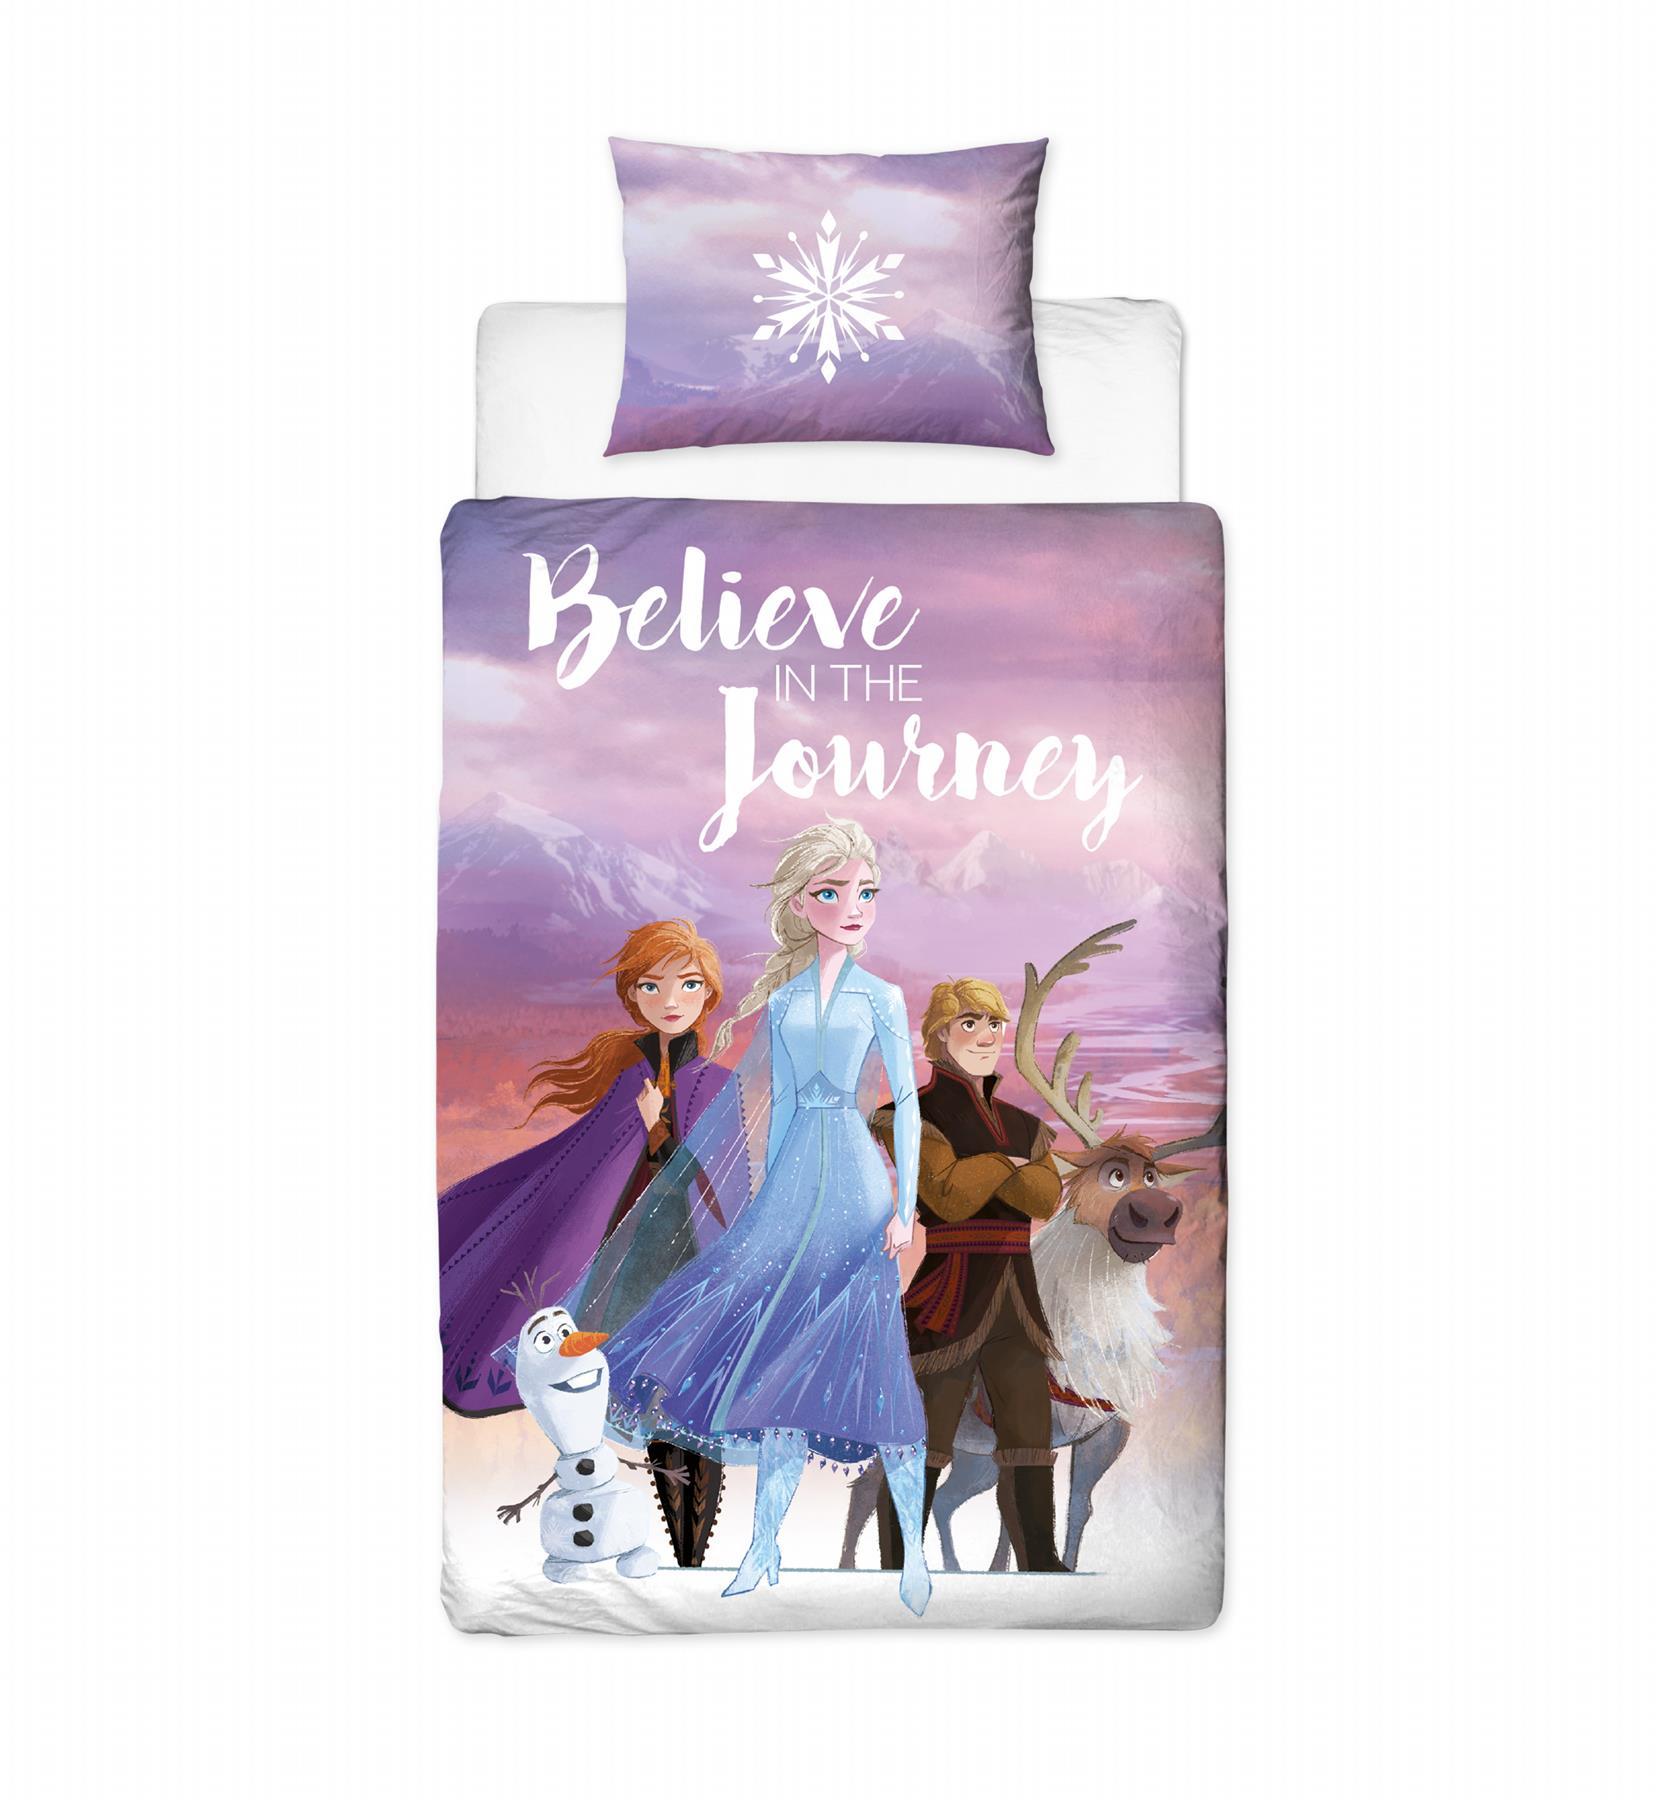 Official-Frozen-2-Duvet-Covers-Single-Double-Reversible-Bedding-Elsa-Anna-Olaf thumbnail 16